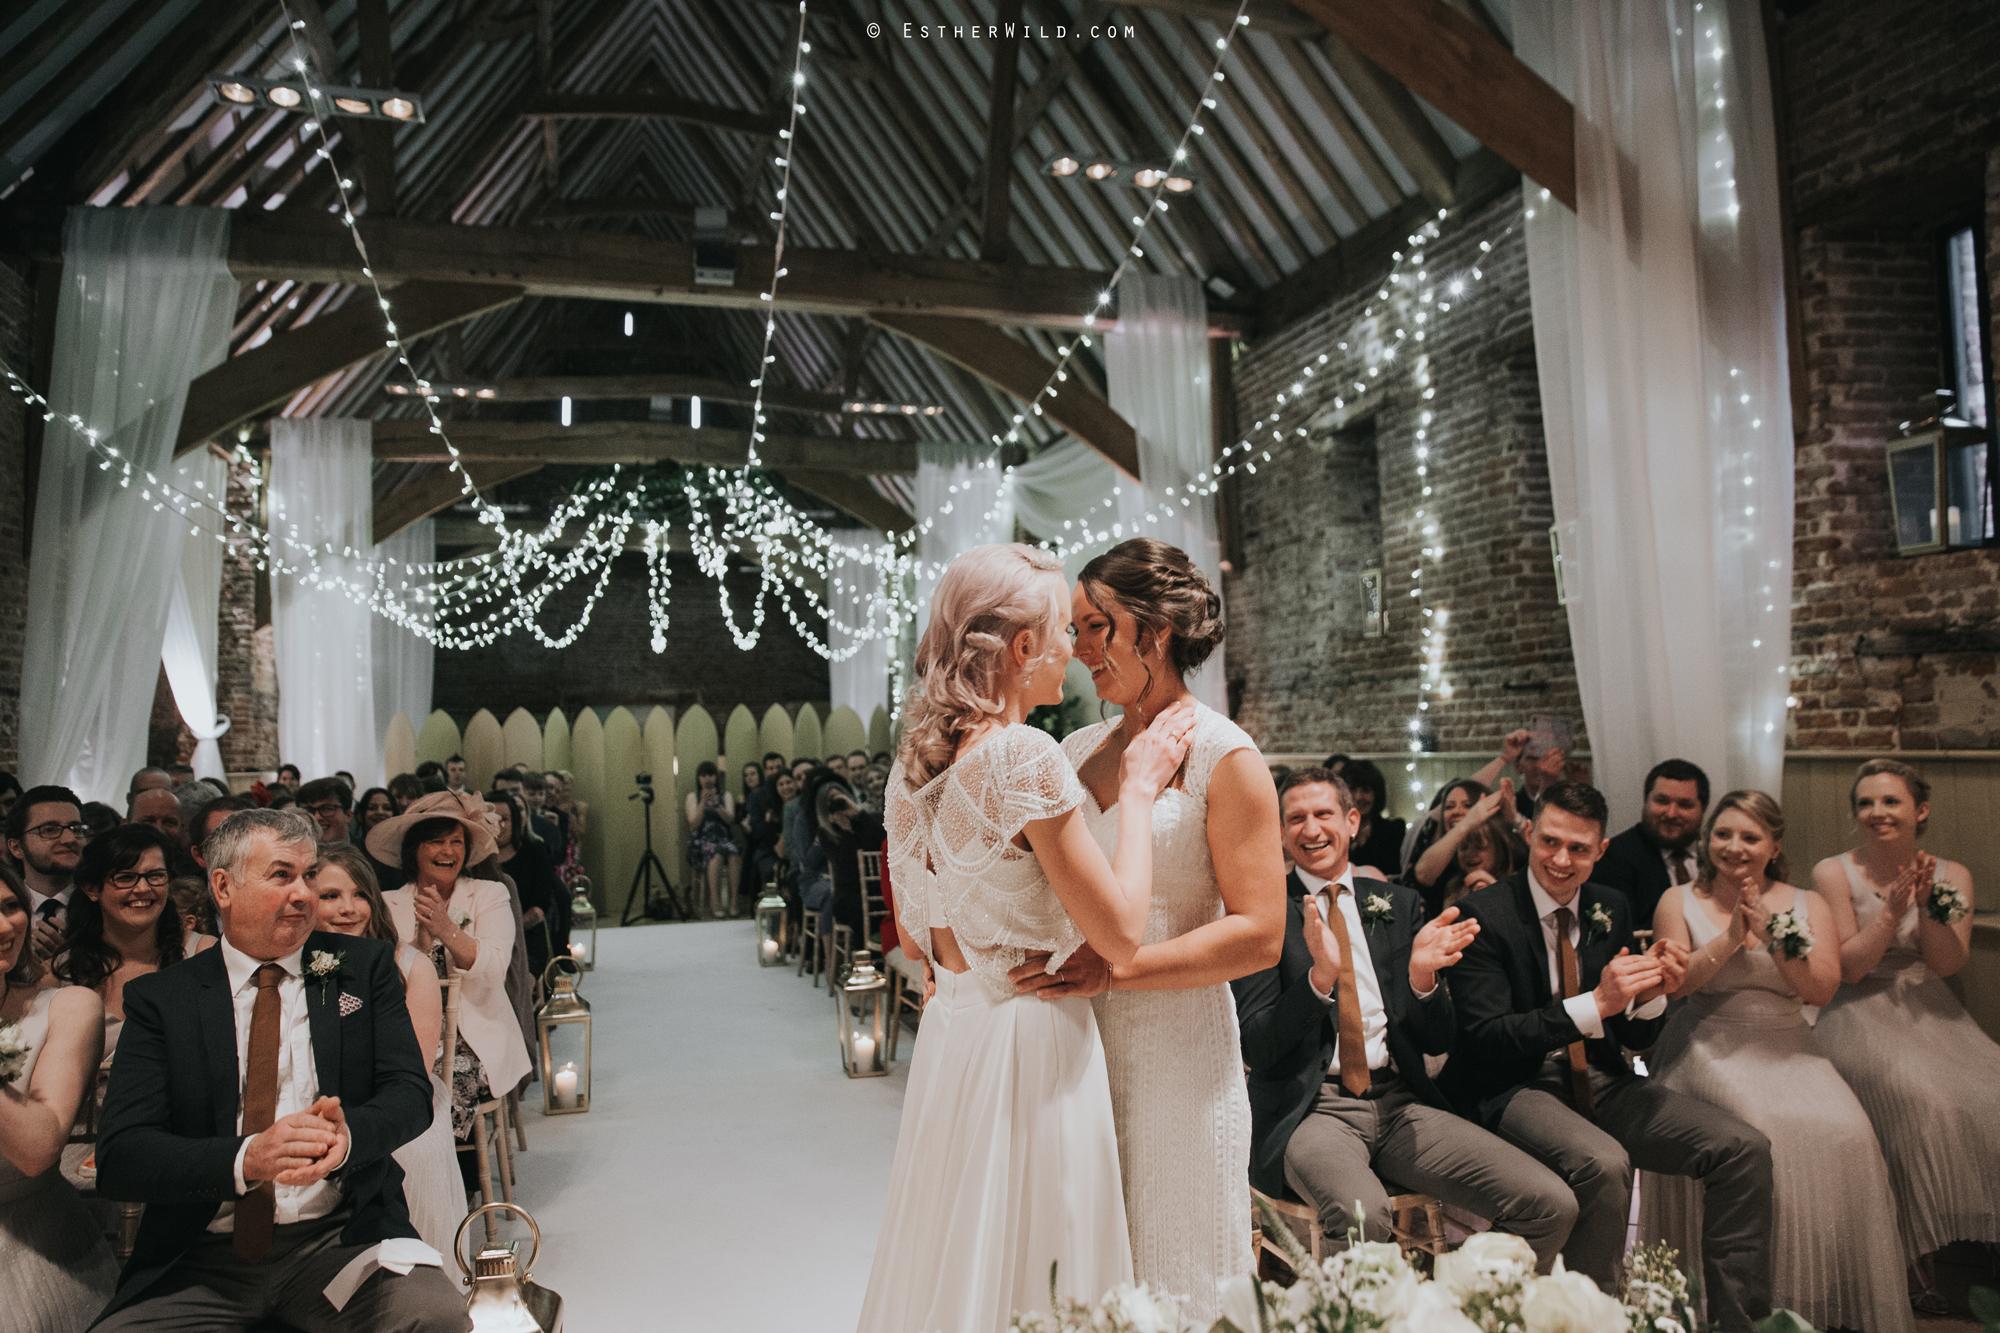 Elms_Barn_Weddings_Suffolk_Photographer_Copyright_Esther_Wild_IMG_1274.jpg